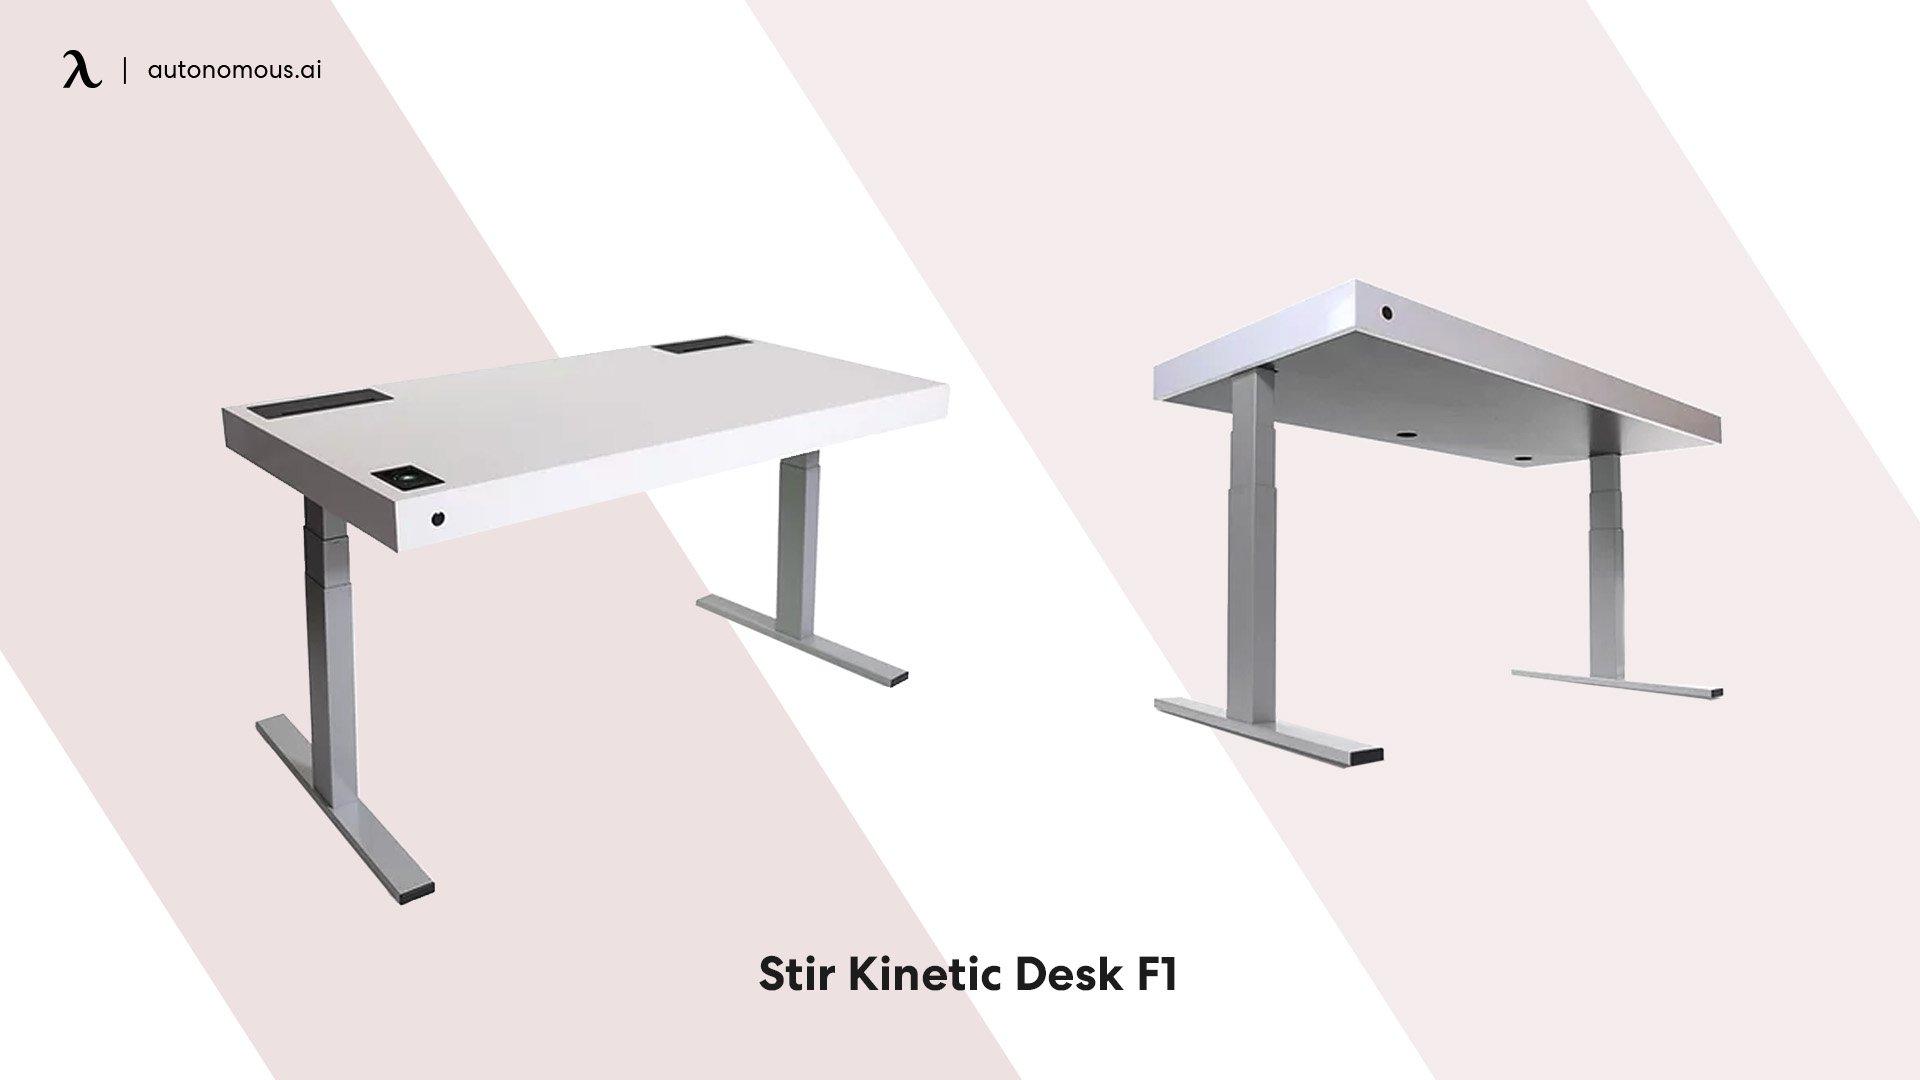 Photo of Stir Kinetic Desk